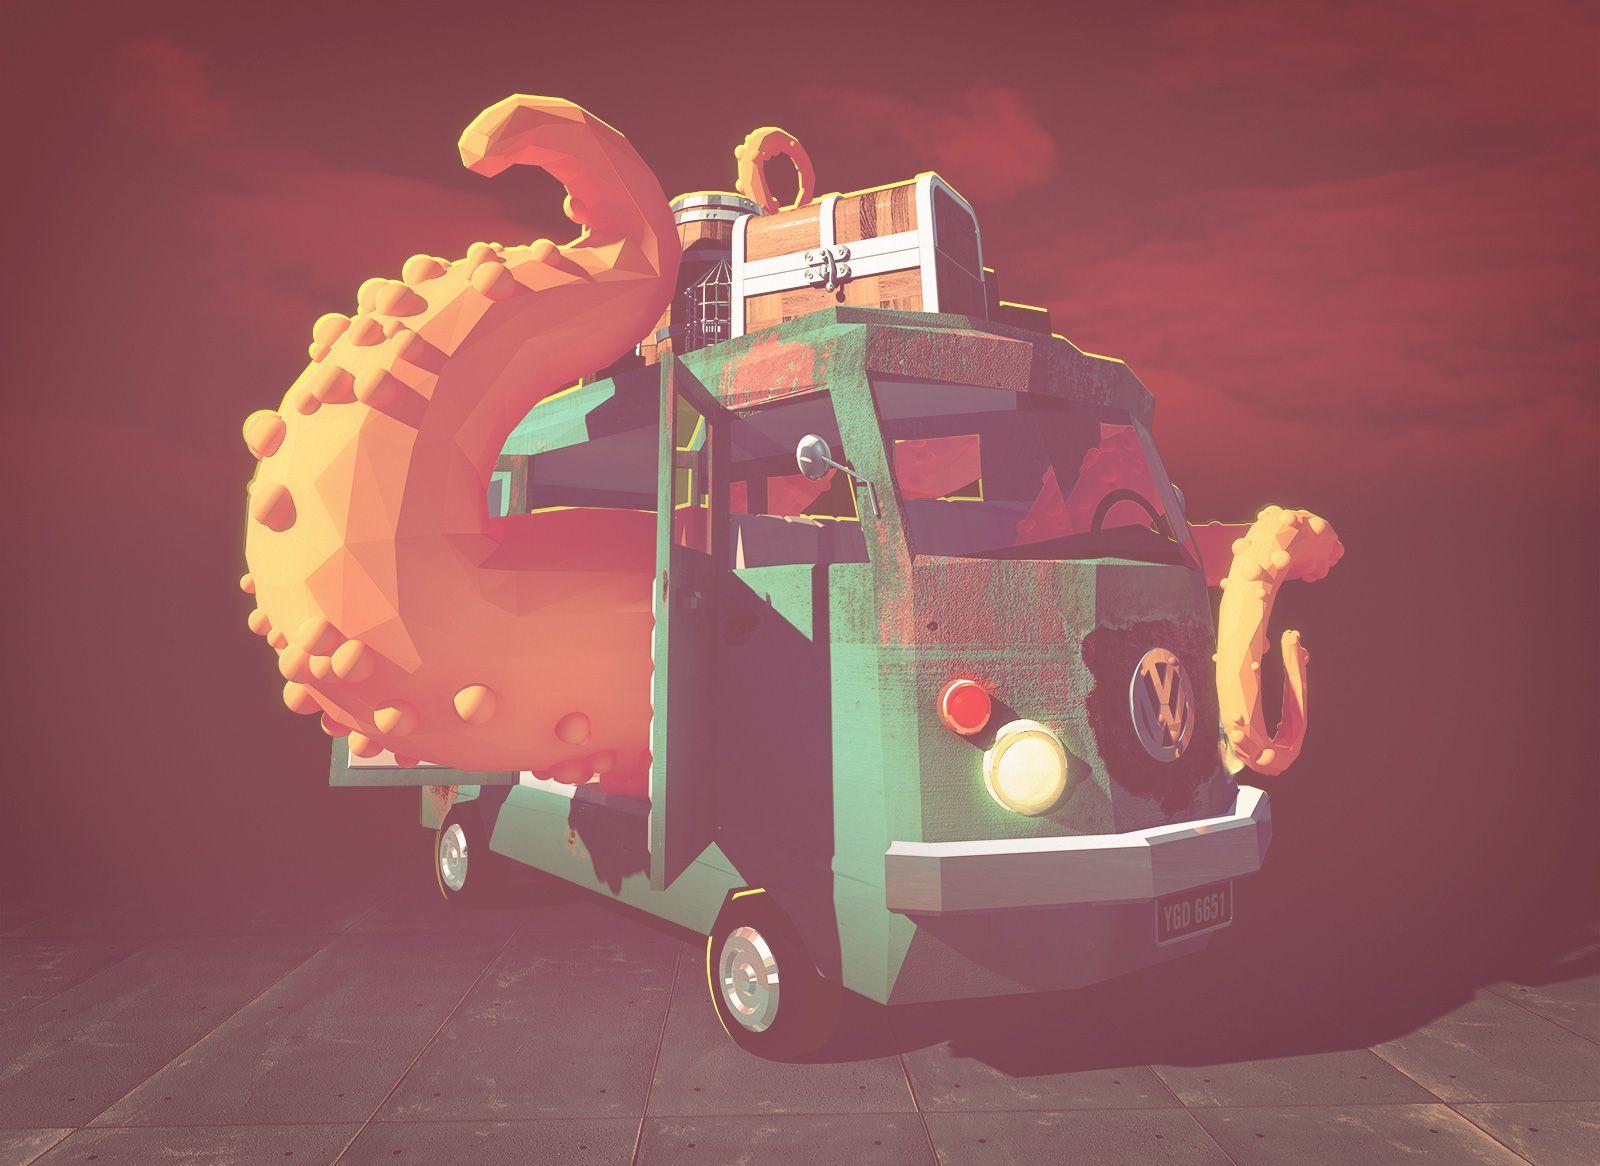 FlavioMontiel.com / Doom Wagon